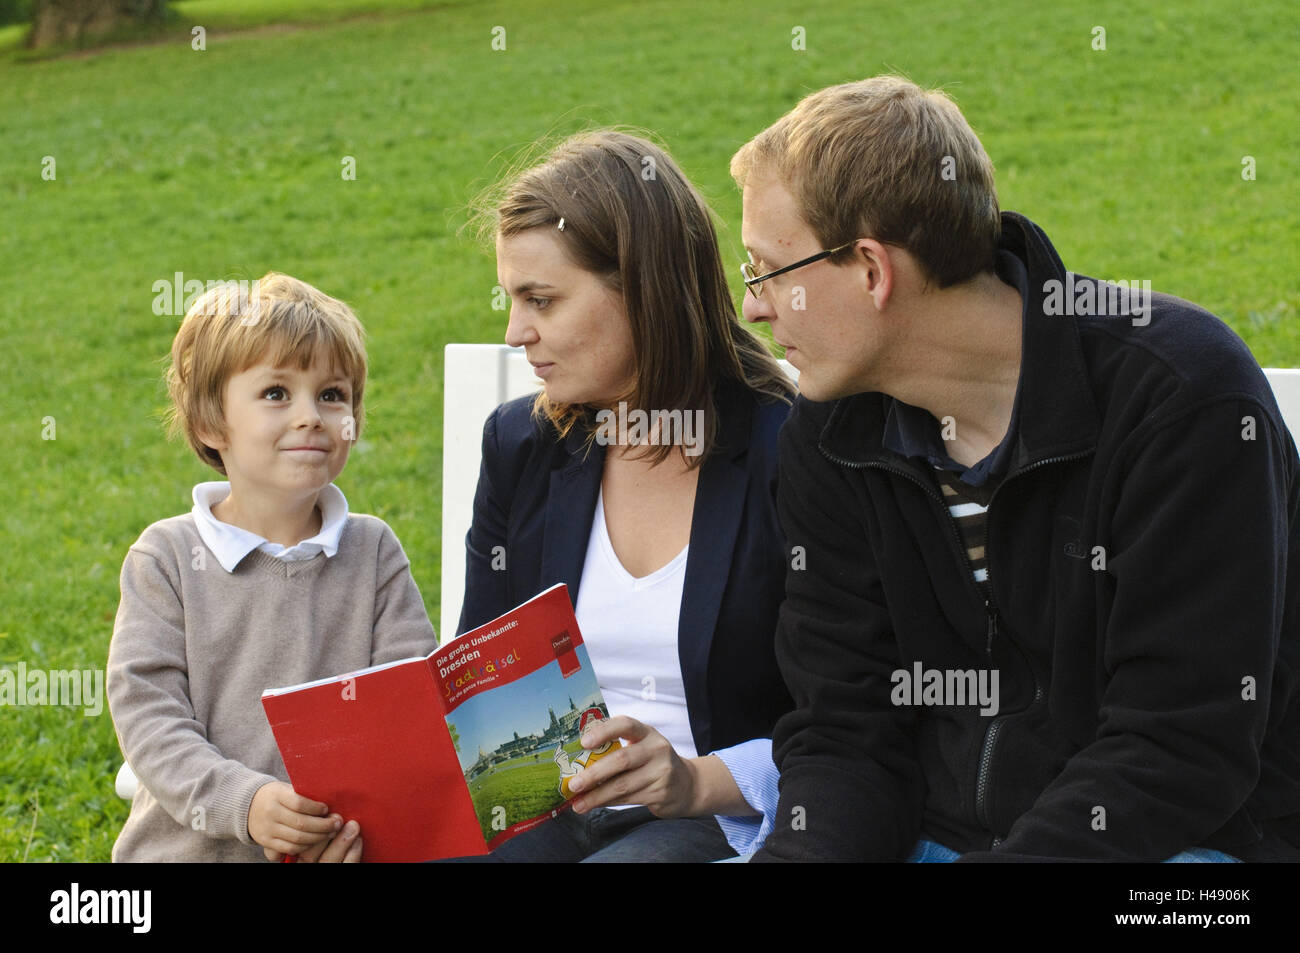 Dresde, la familia Riddle, se afloja la ciudad Foto de stock